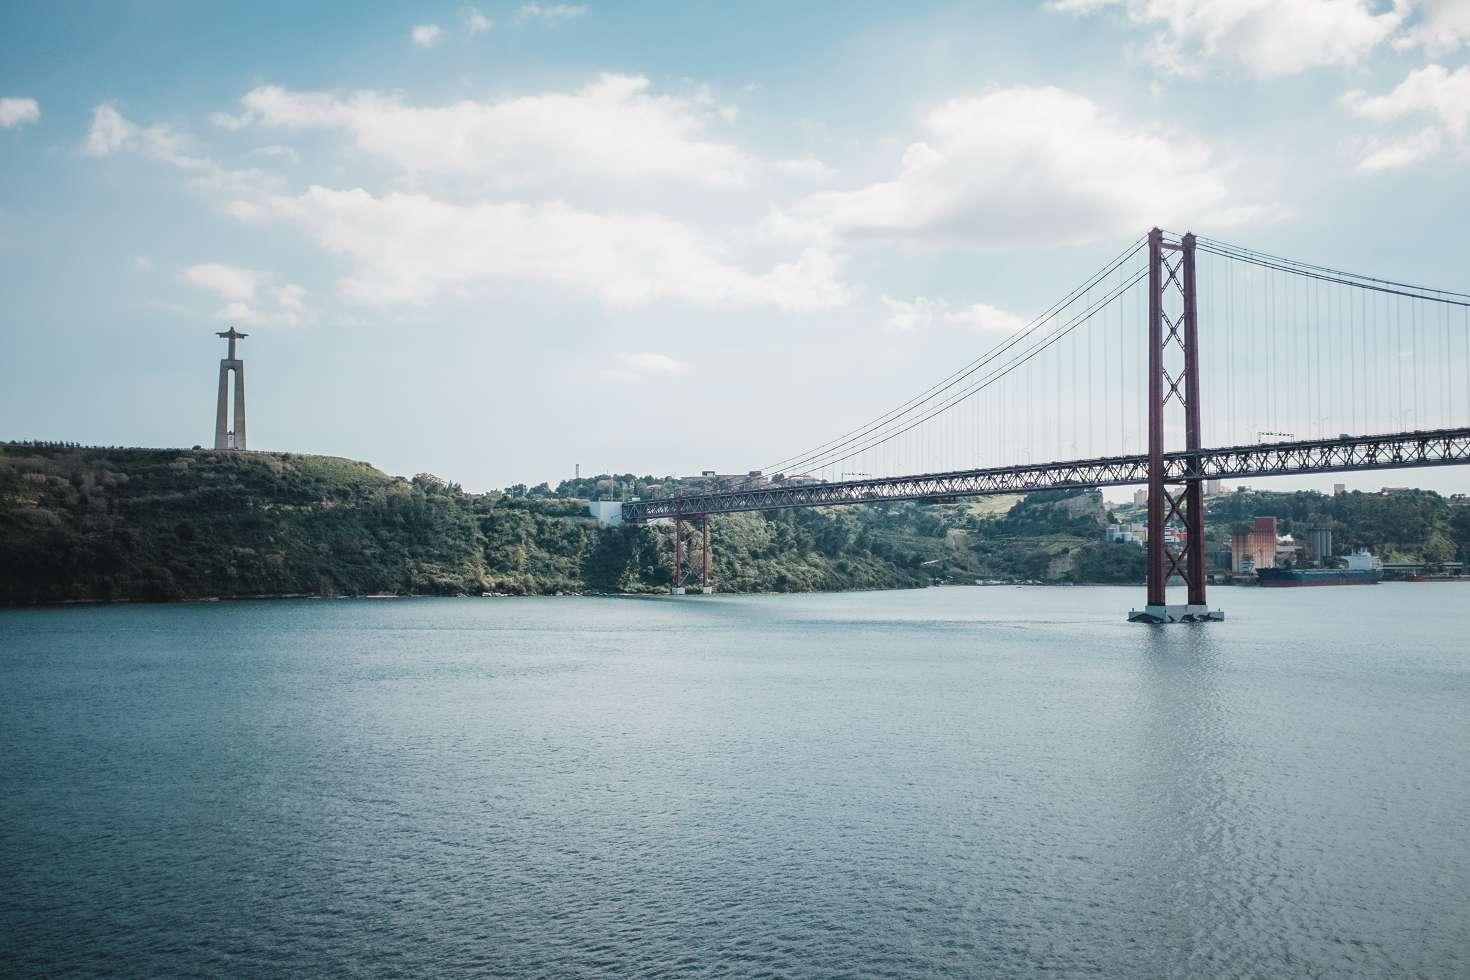 Valencia-Lissabon-Vigo-Stonehenge (52)